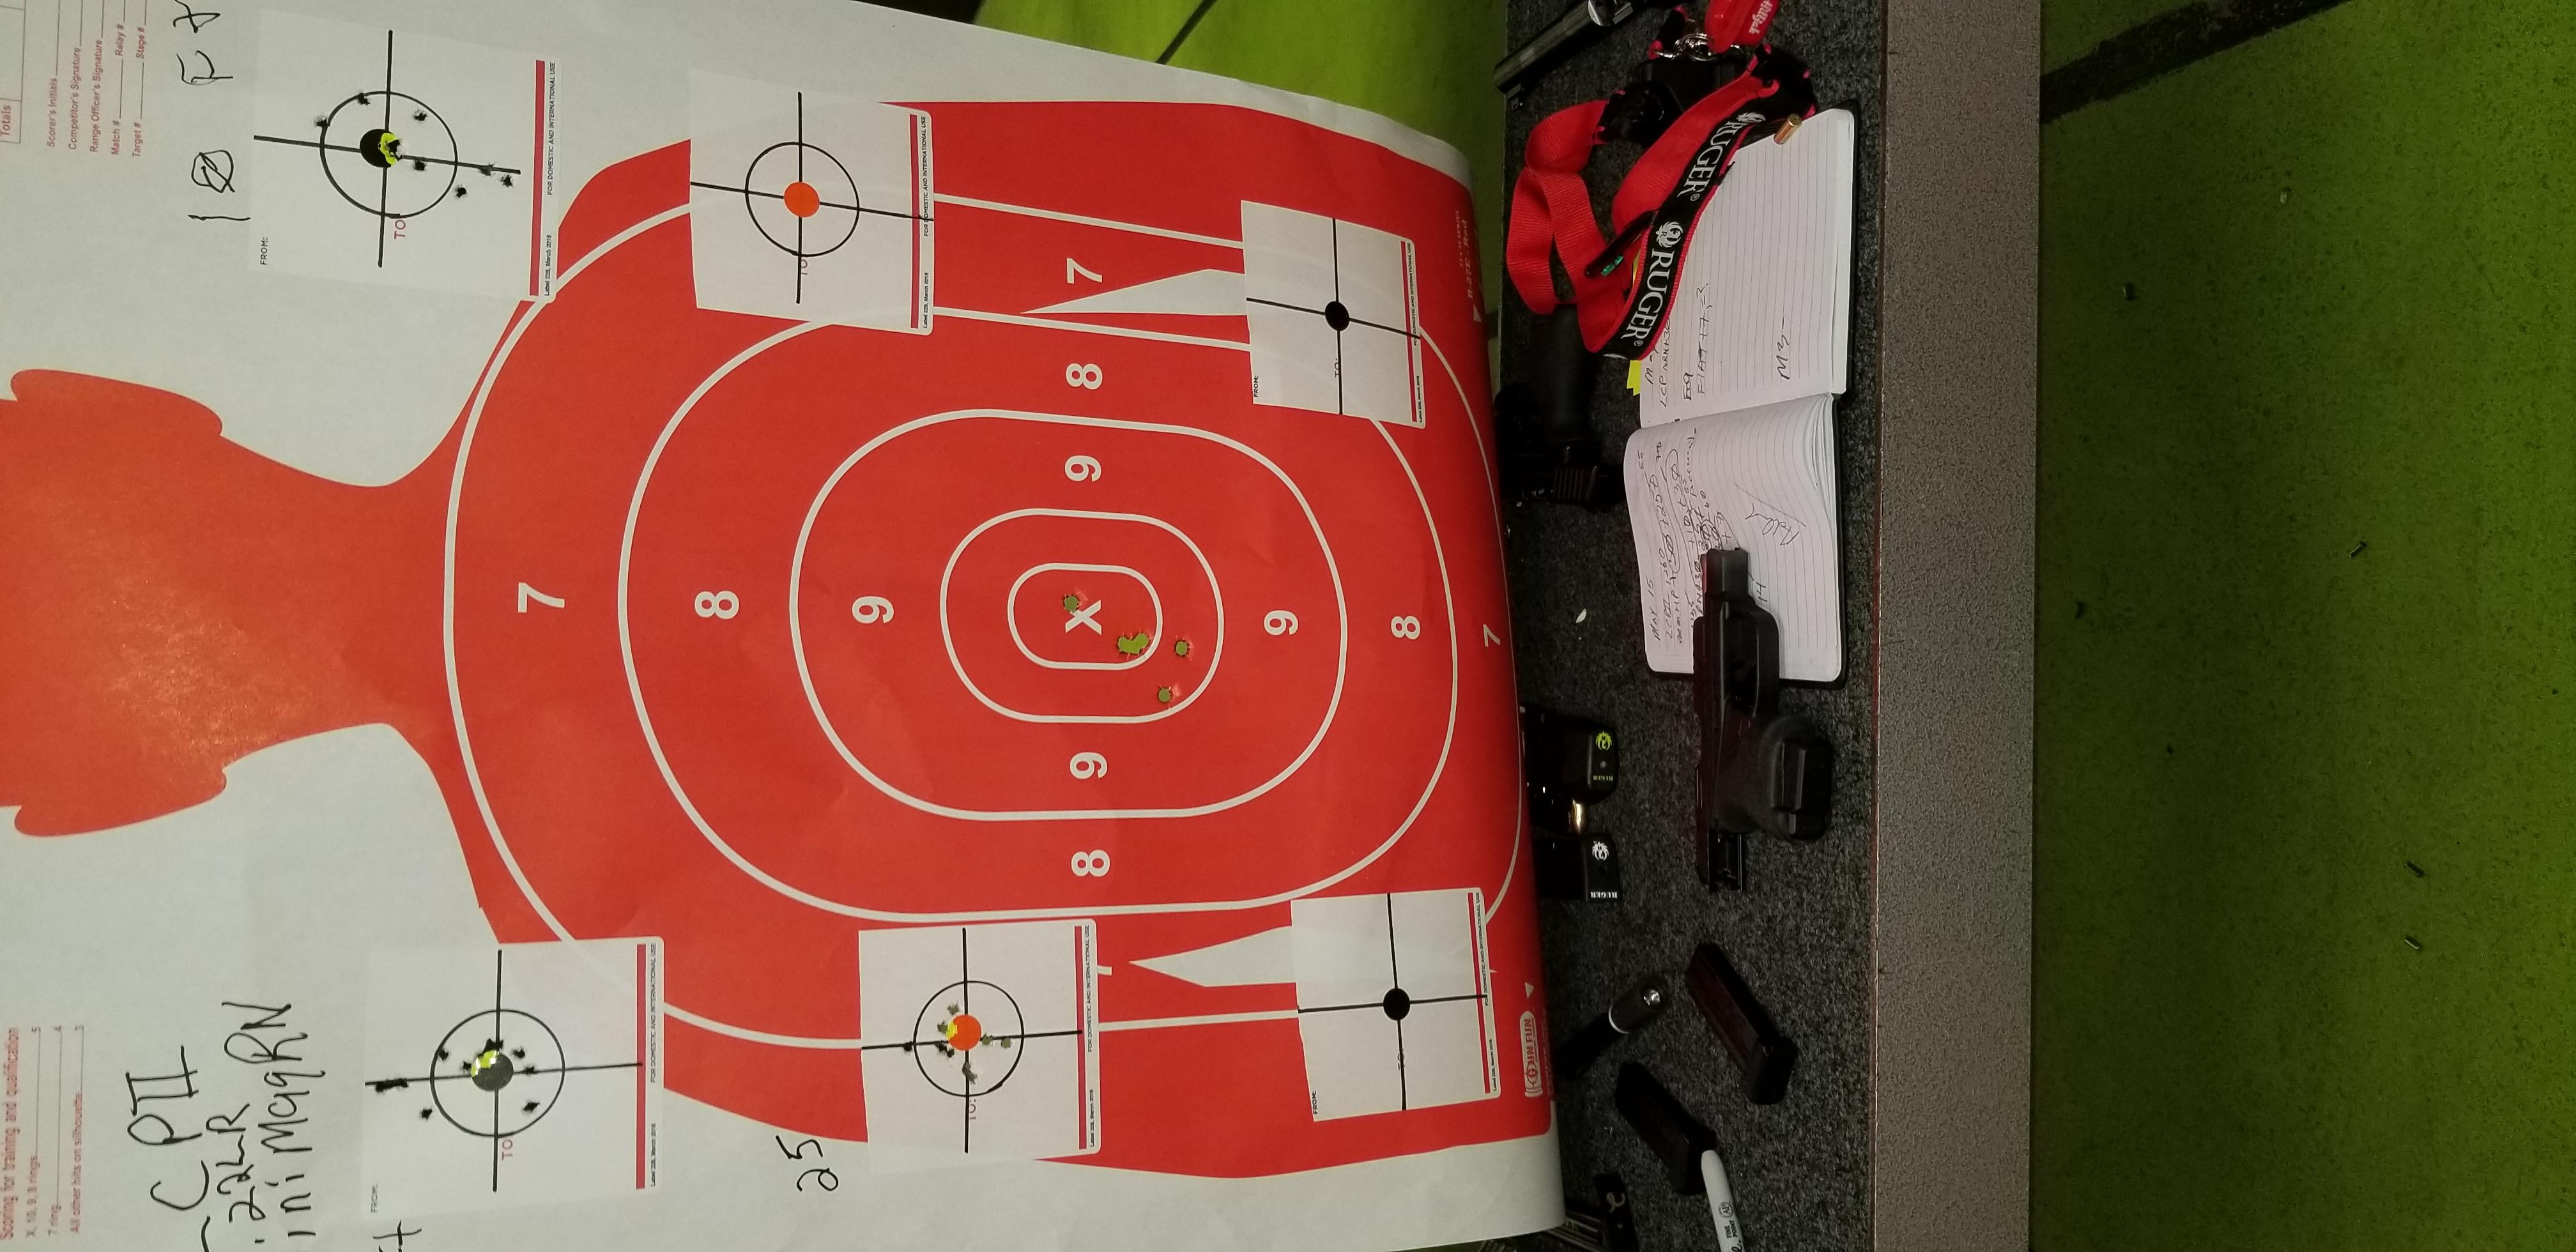 LCPII 22LR First ammo test.-a_lcpii22lr_second.jpg